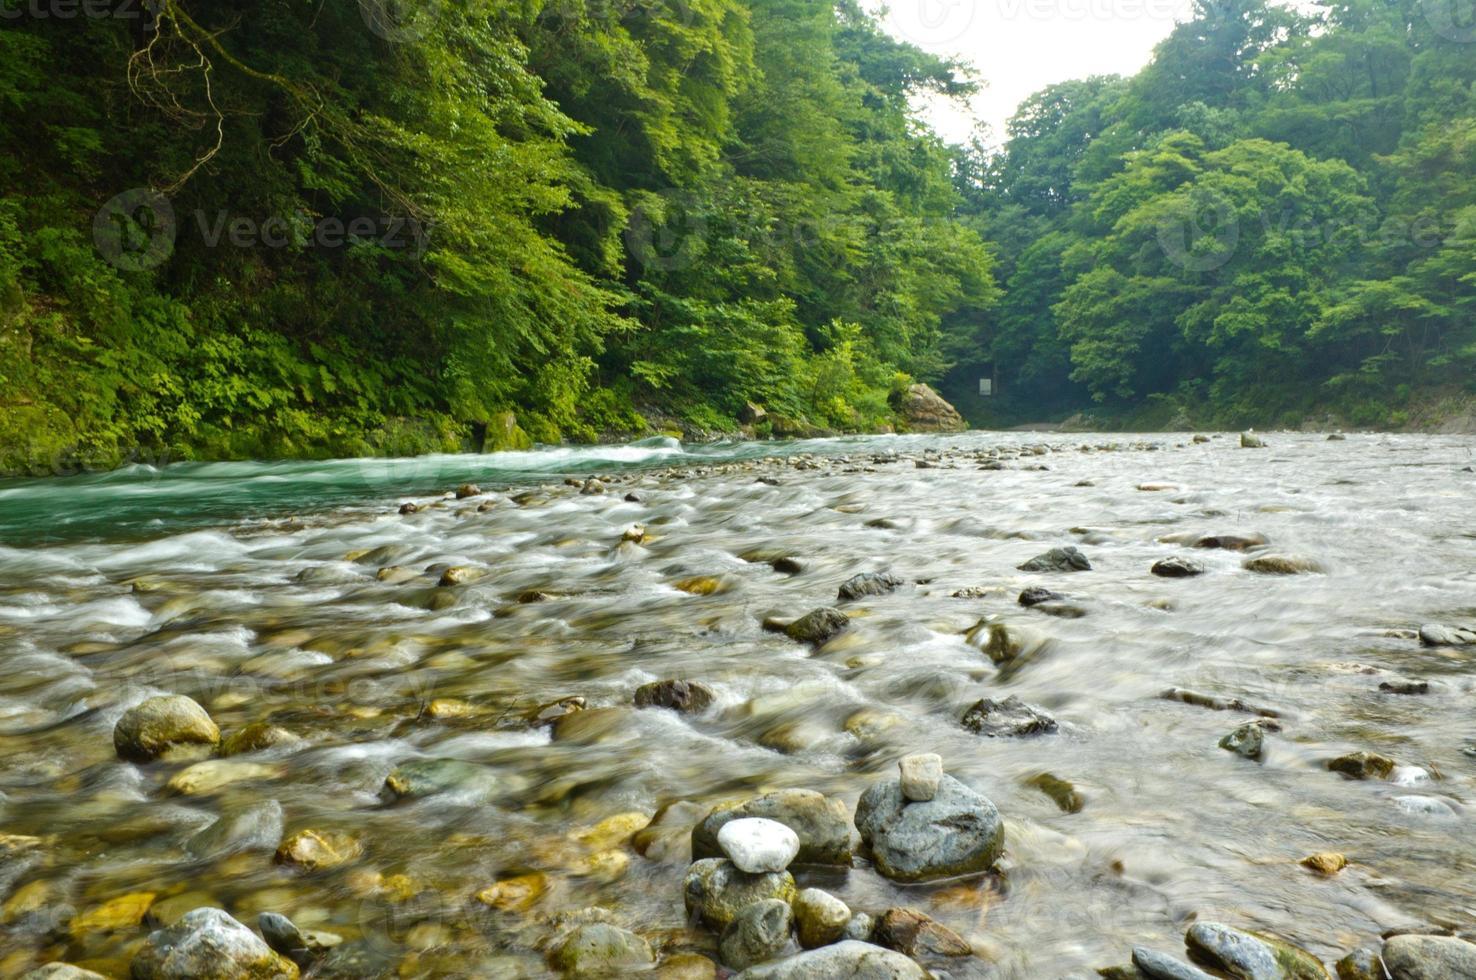 river pebble-ridden photo